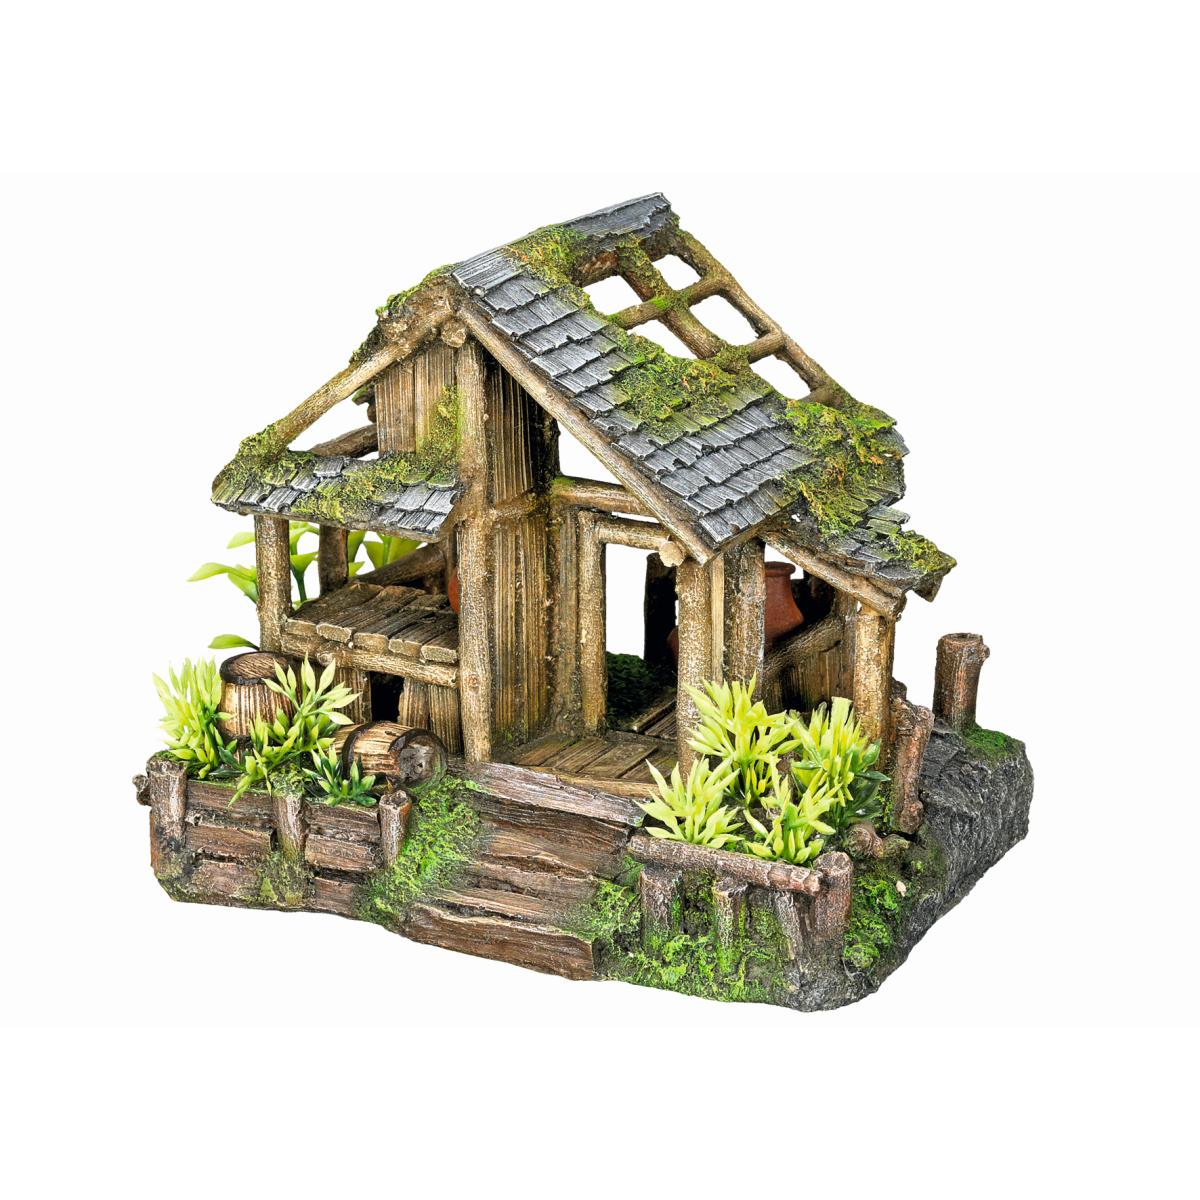 Aqua deco house with plants meerkleurig